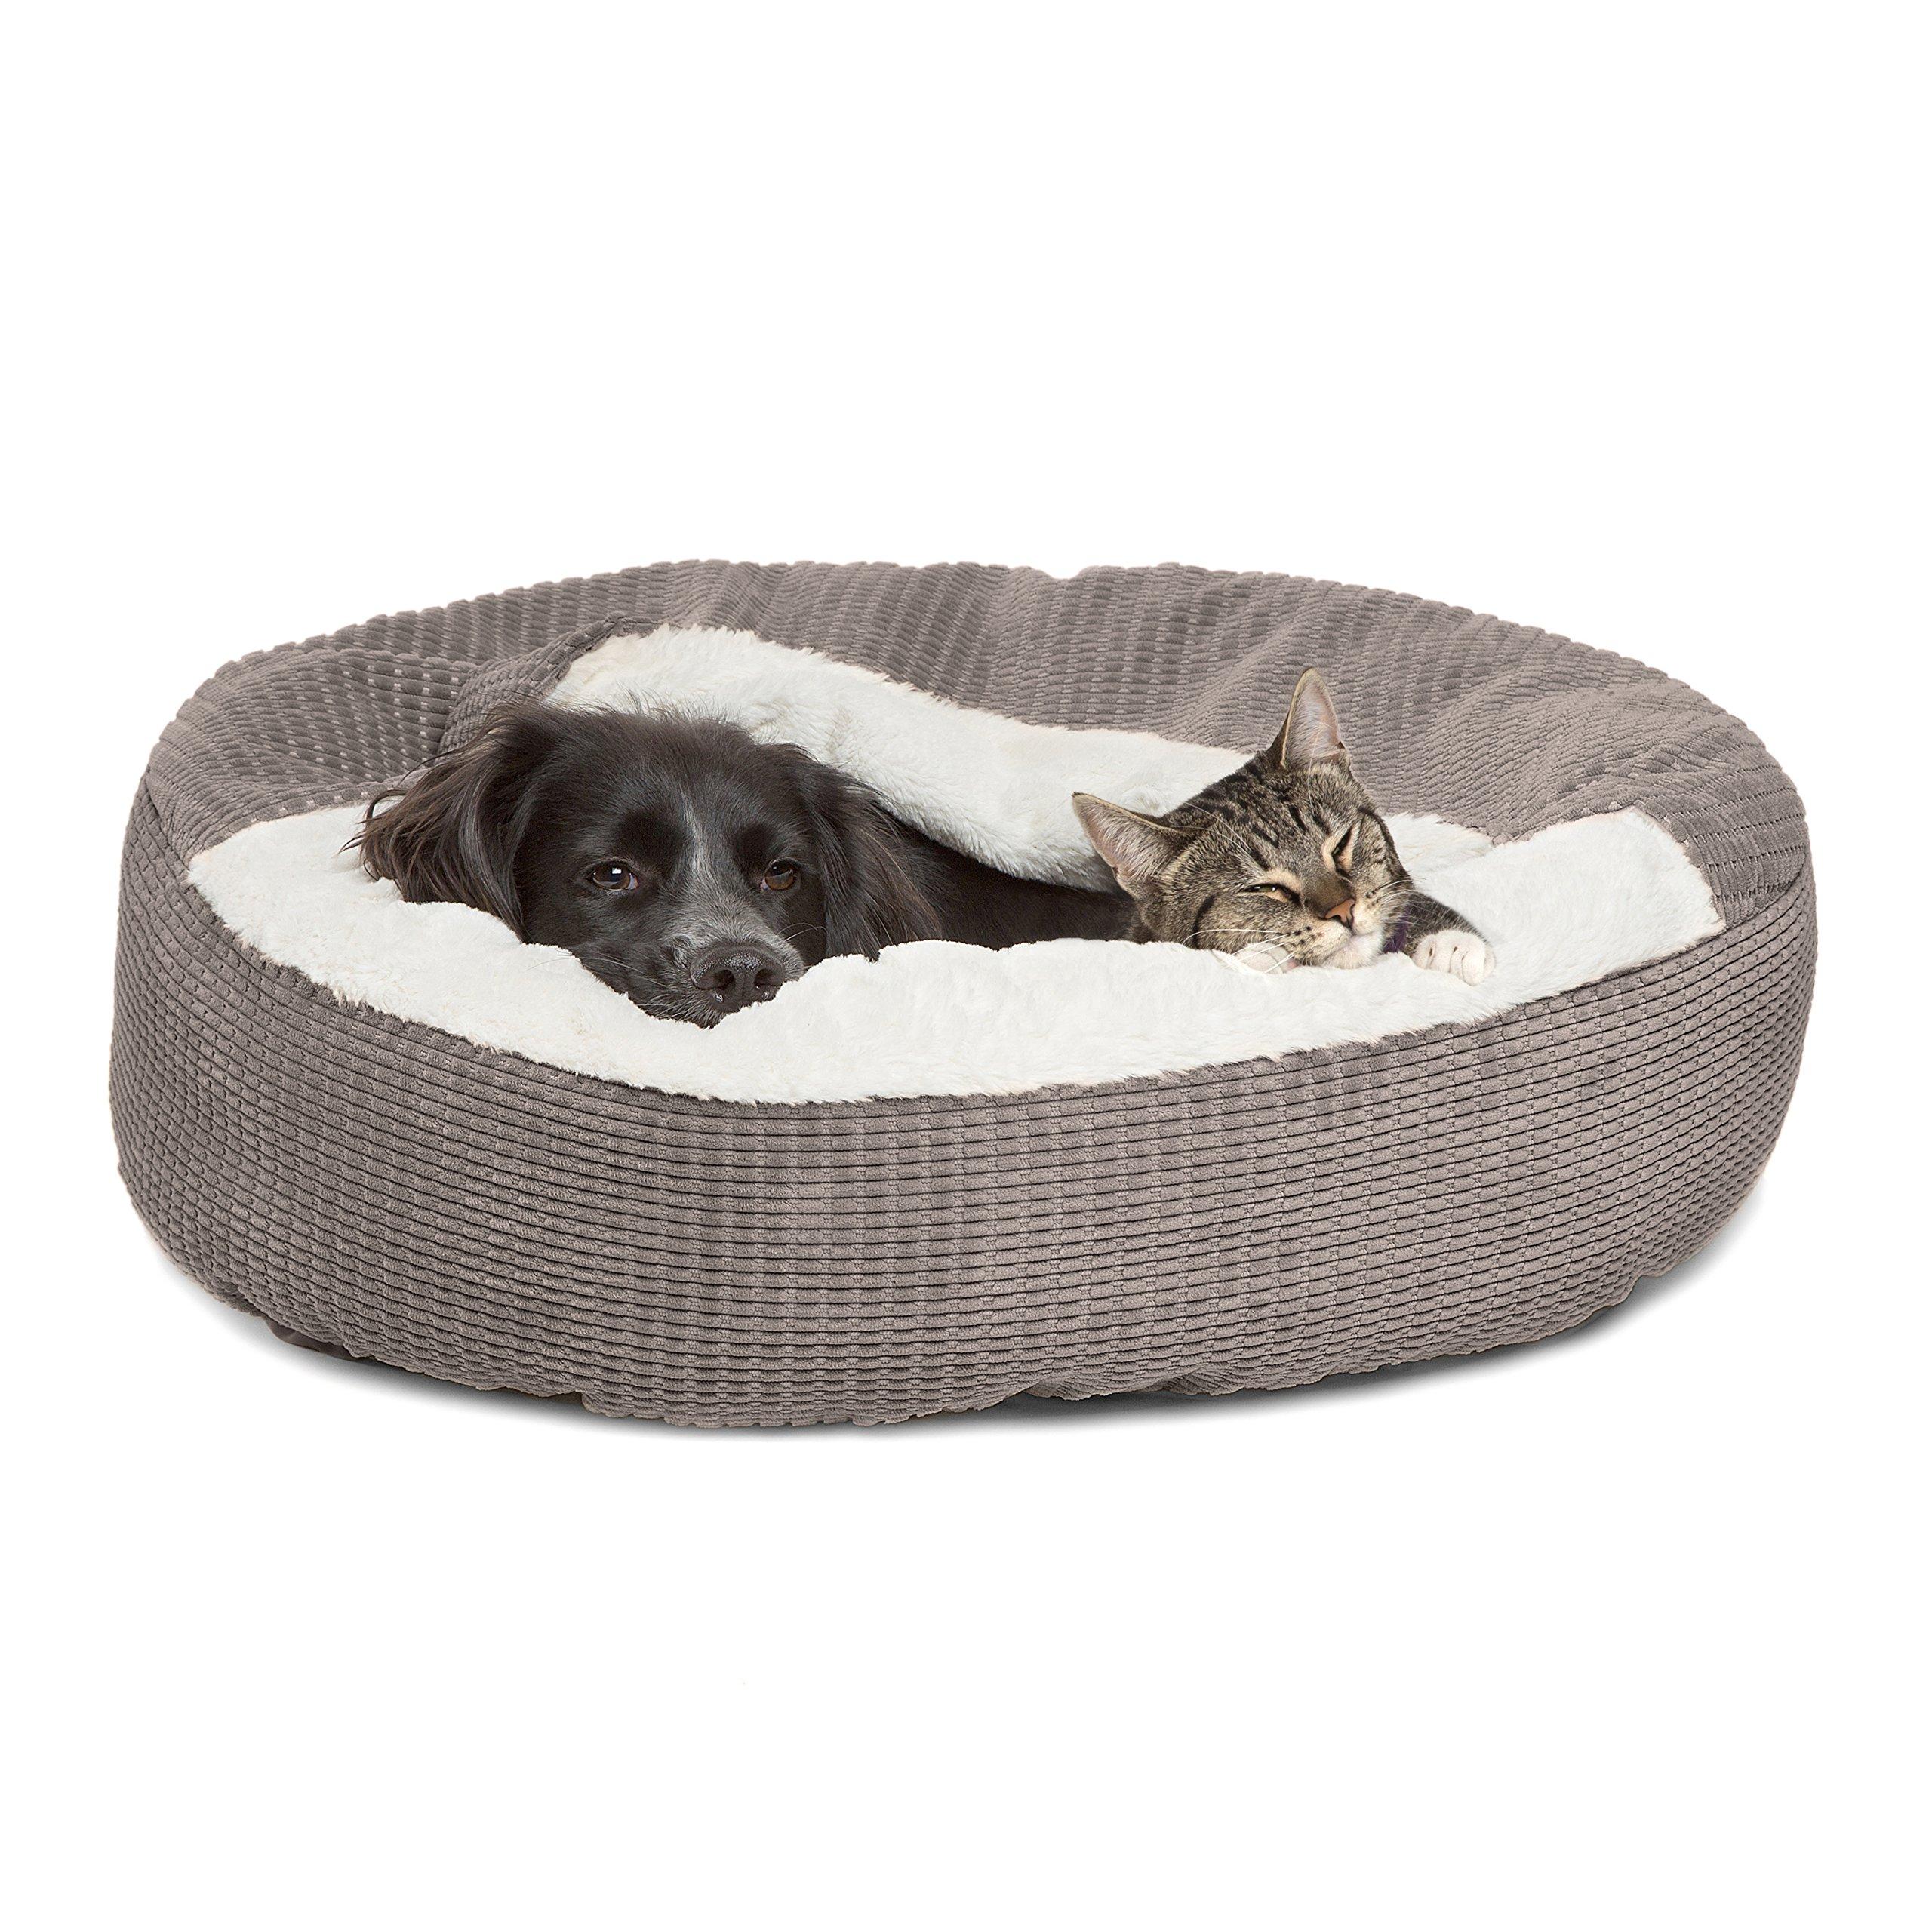 Best Friends by Sheri Cozy Cuddler in Mason Dog/Cat Bed, 26'' x 26'', Gray